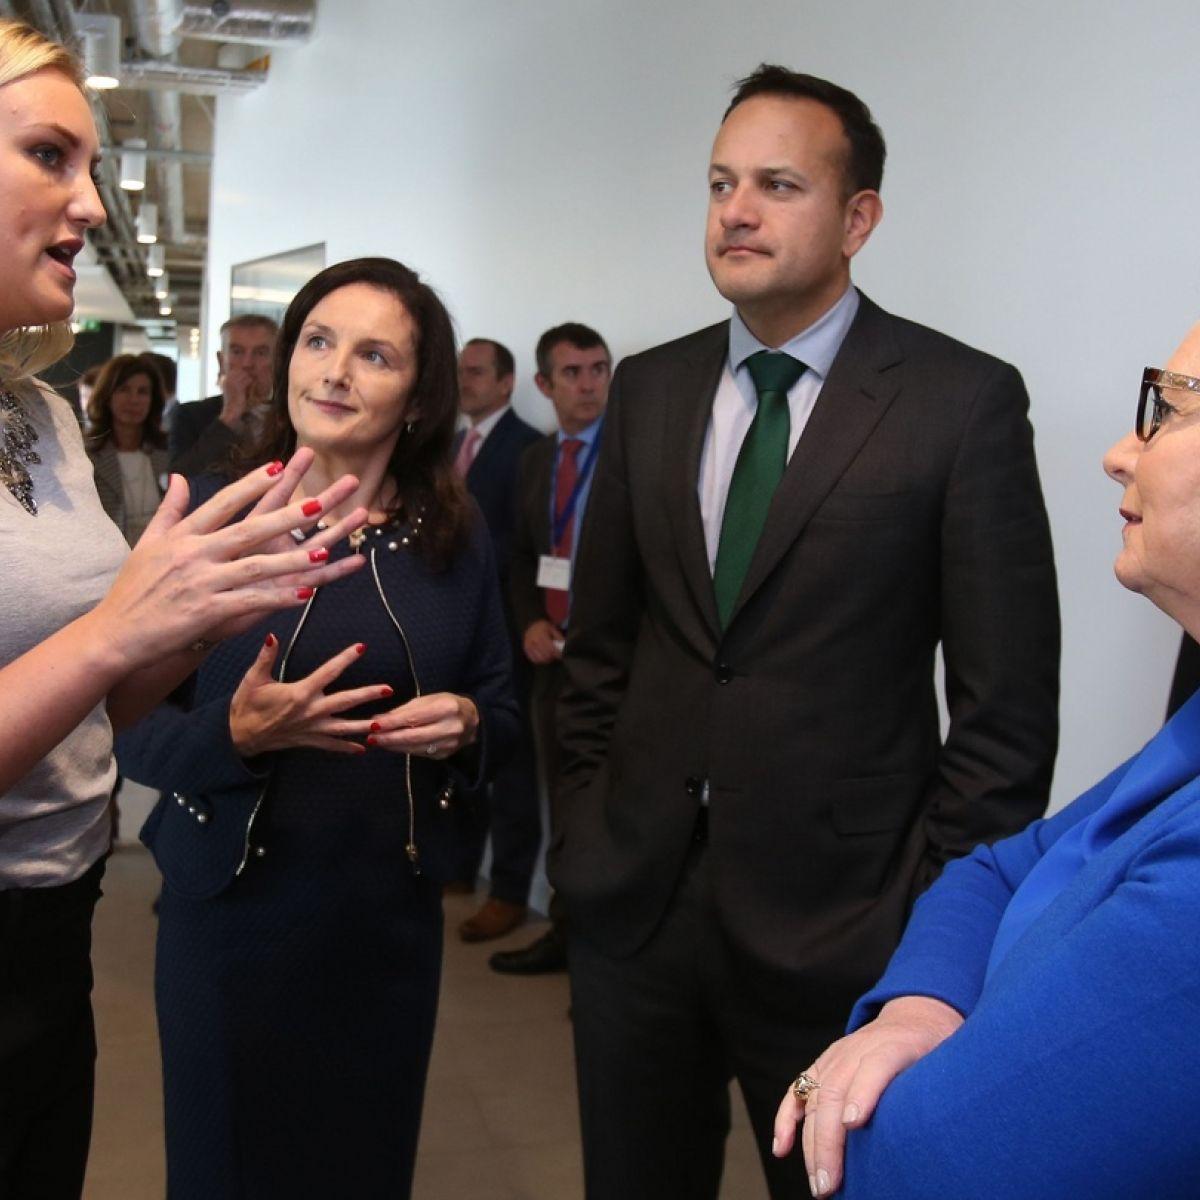 LinkedIn invests €85m in Dublin facility